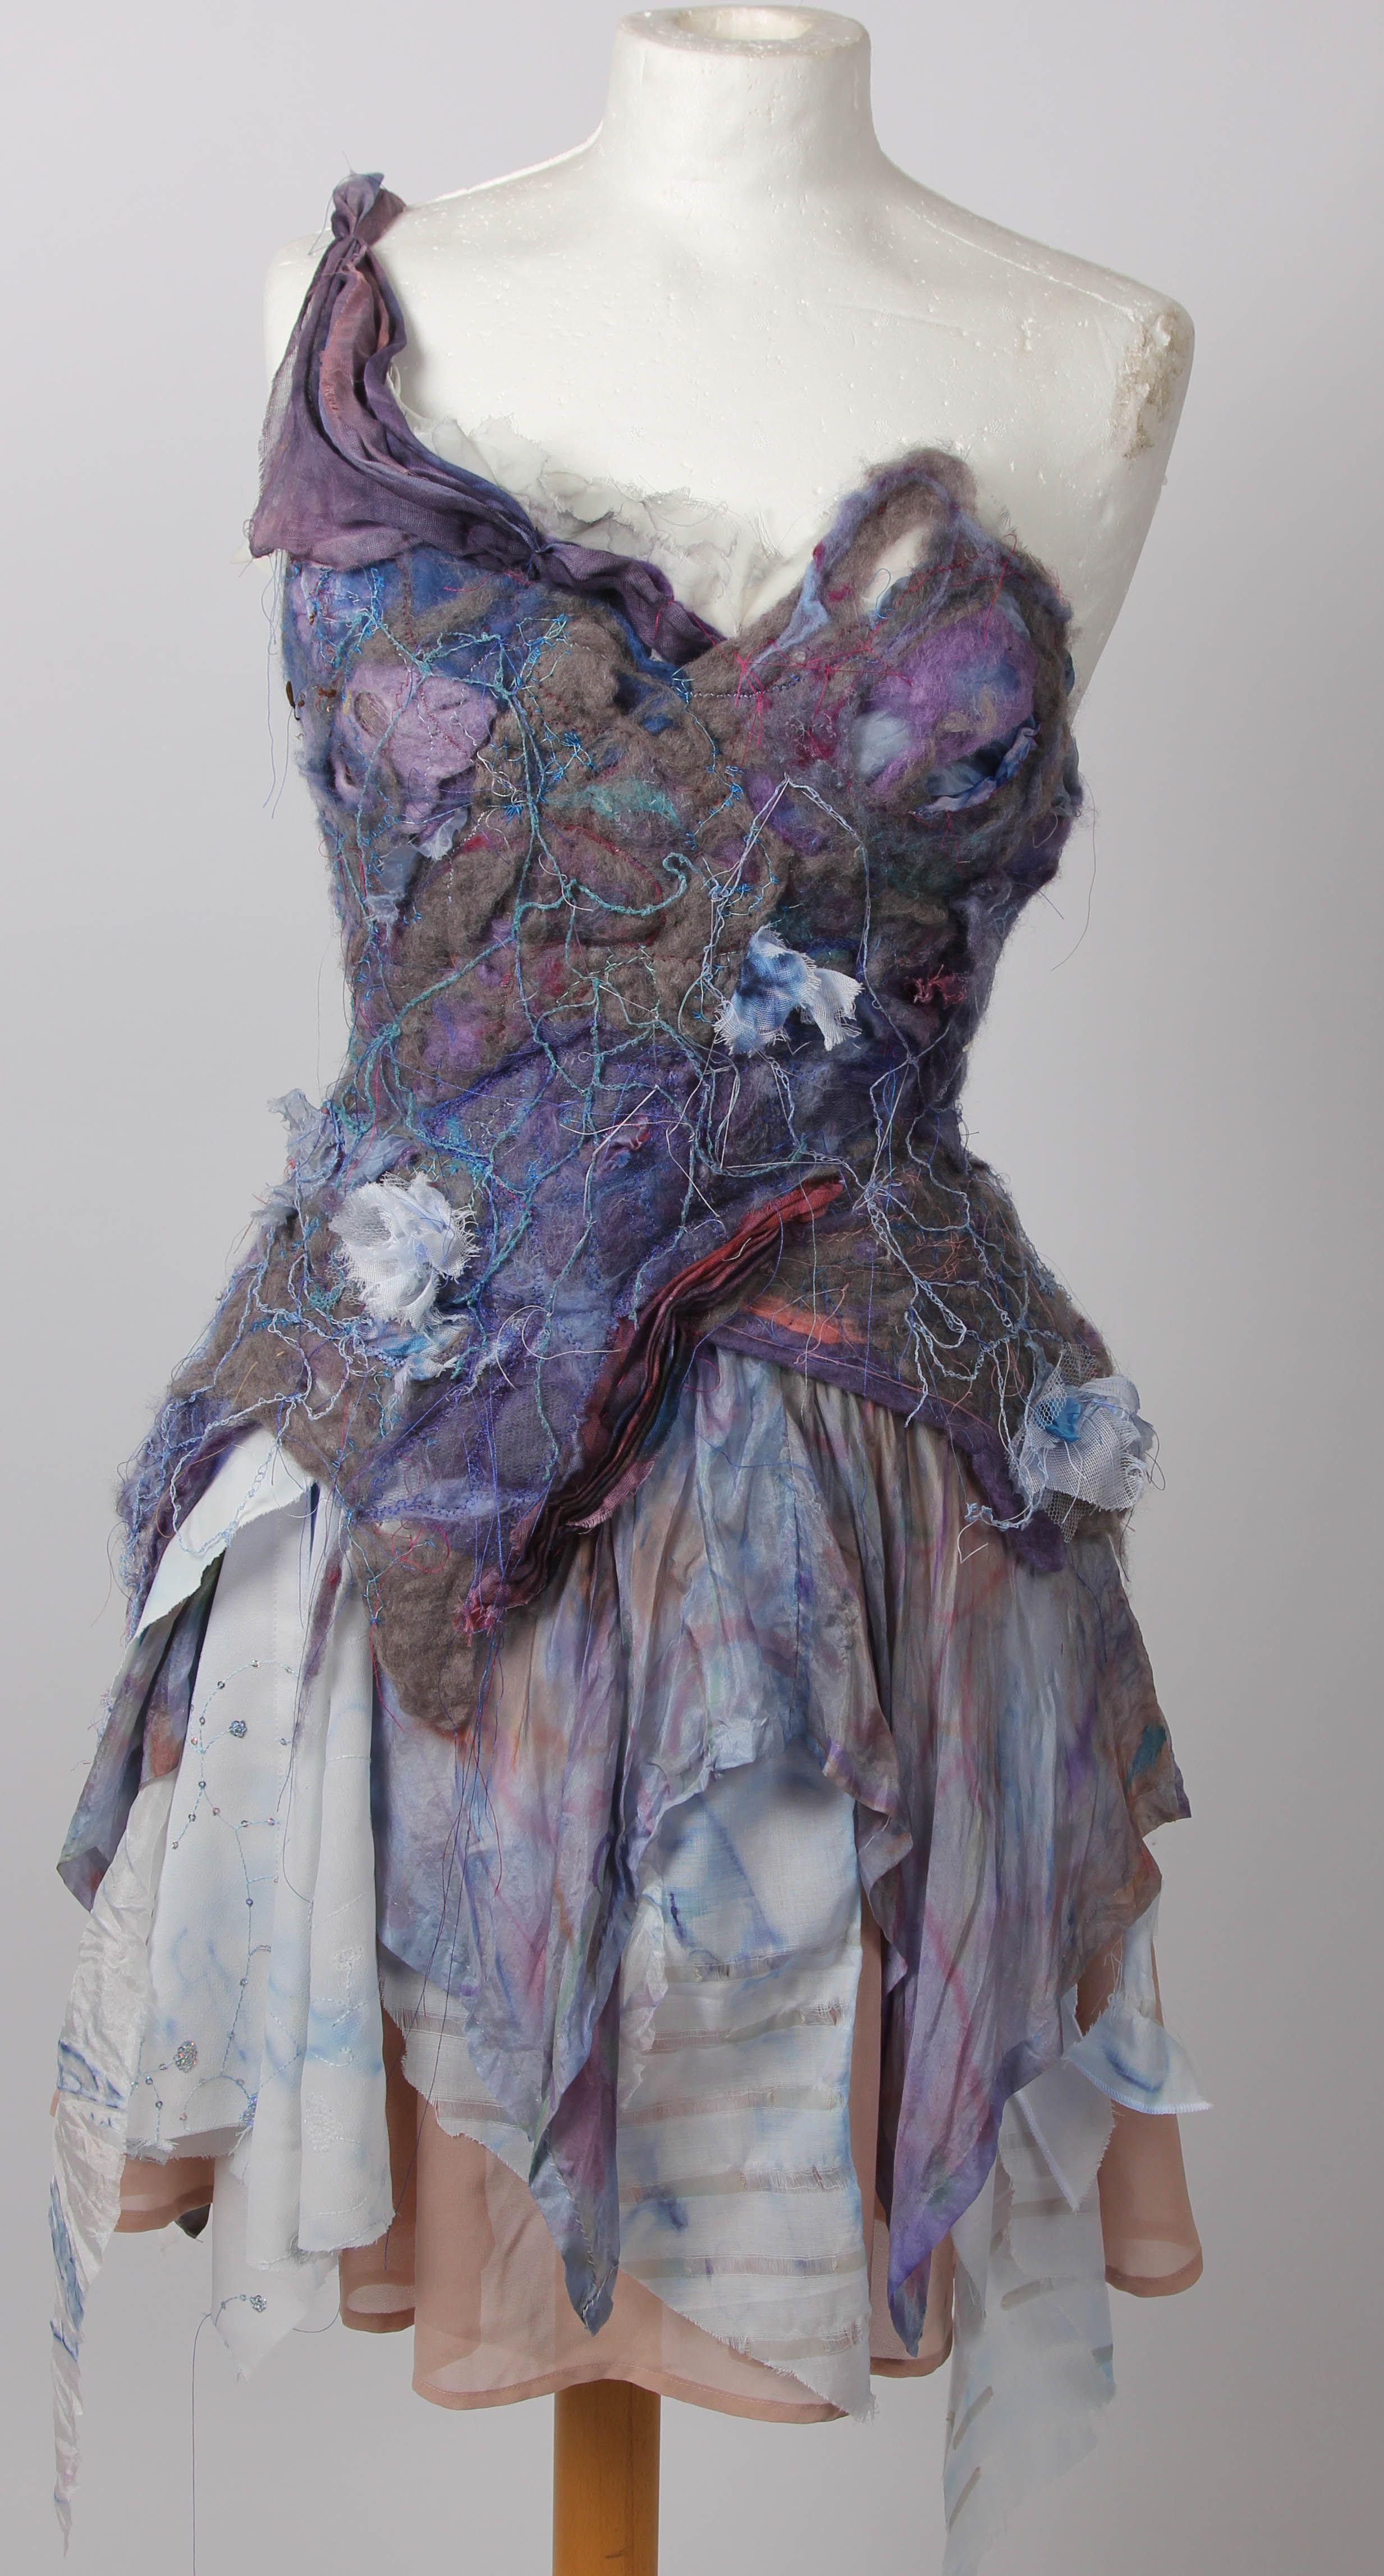 Design Final Outcome Advanced Higher Morrisons Academy Fashion Design Textiles Fashion Art Dress